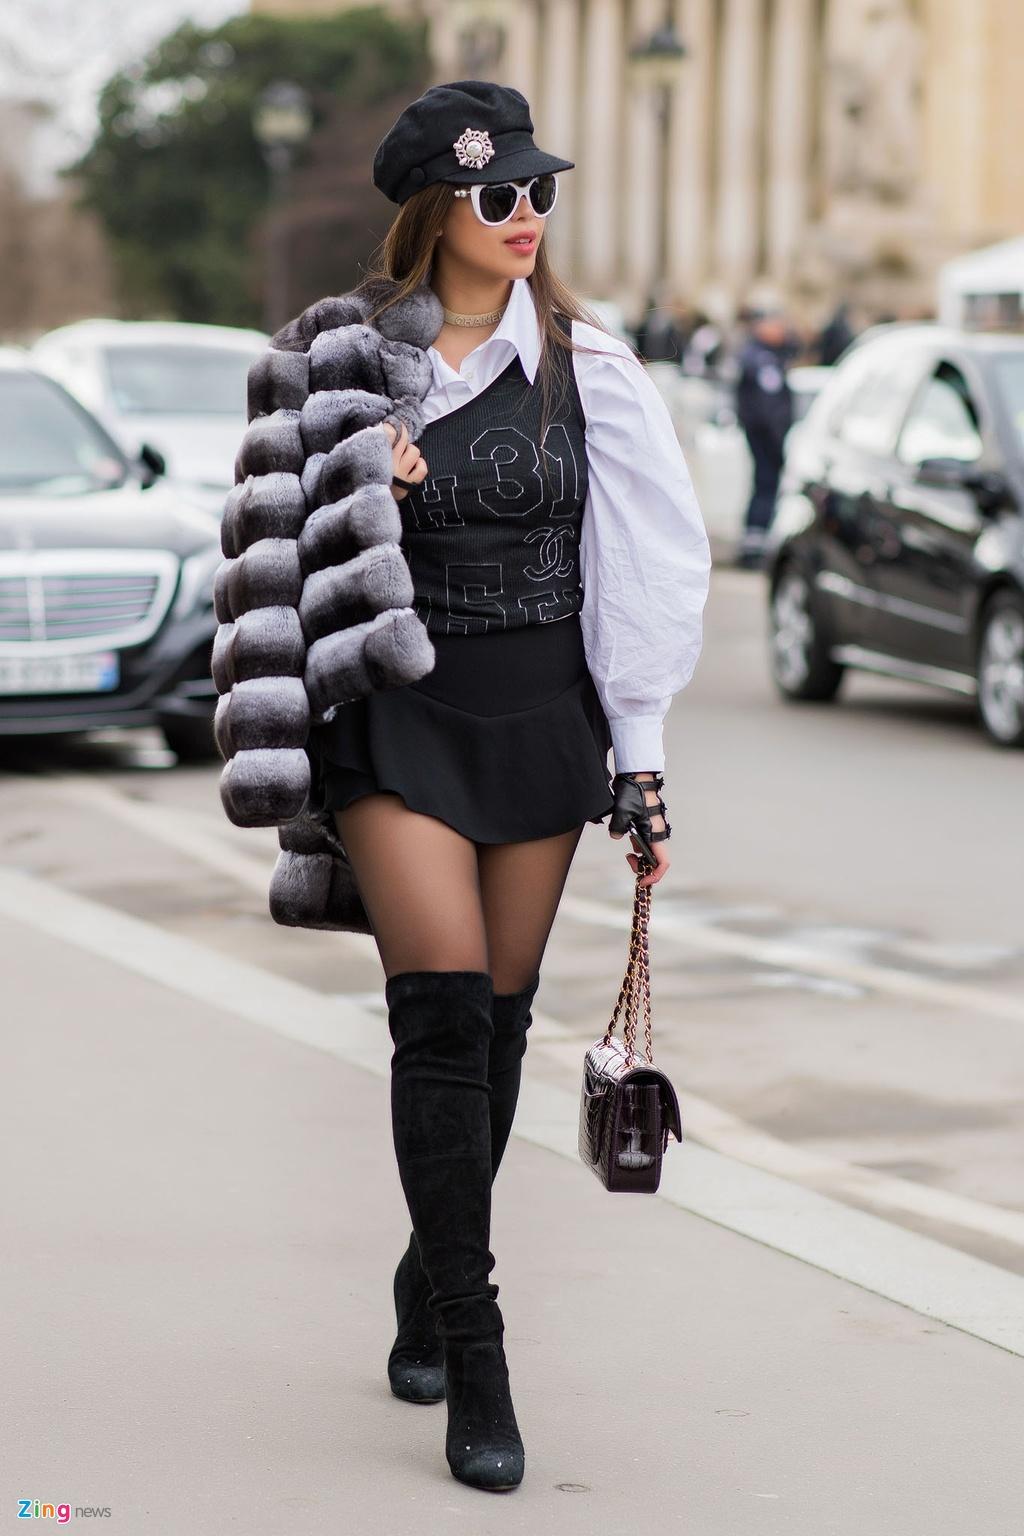 Khong khi nhon nhip truoc them show Chanel cuoi cua Karl Lagerfeld hinh anh 7